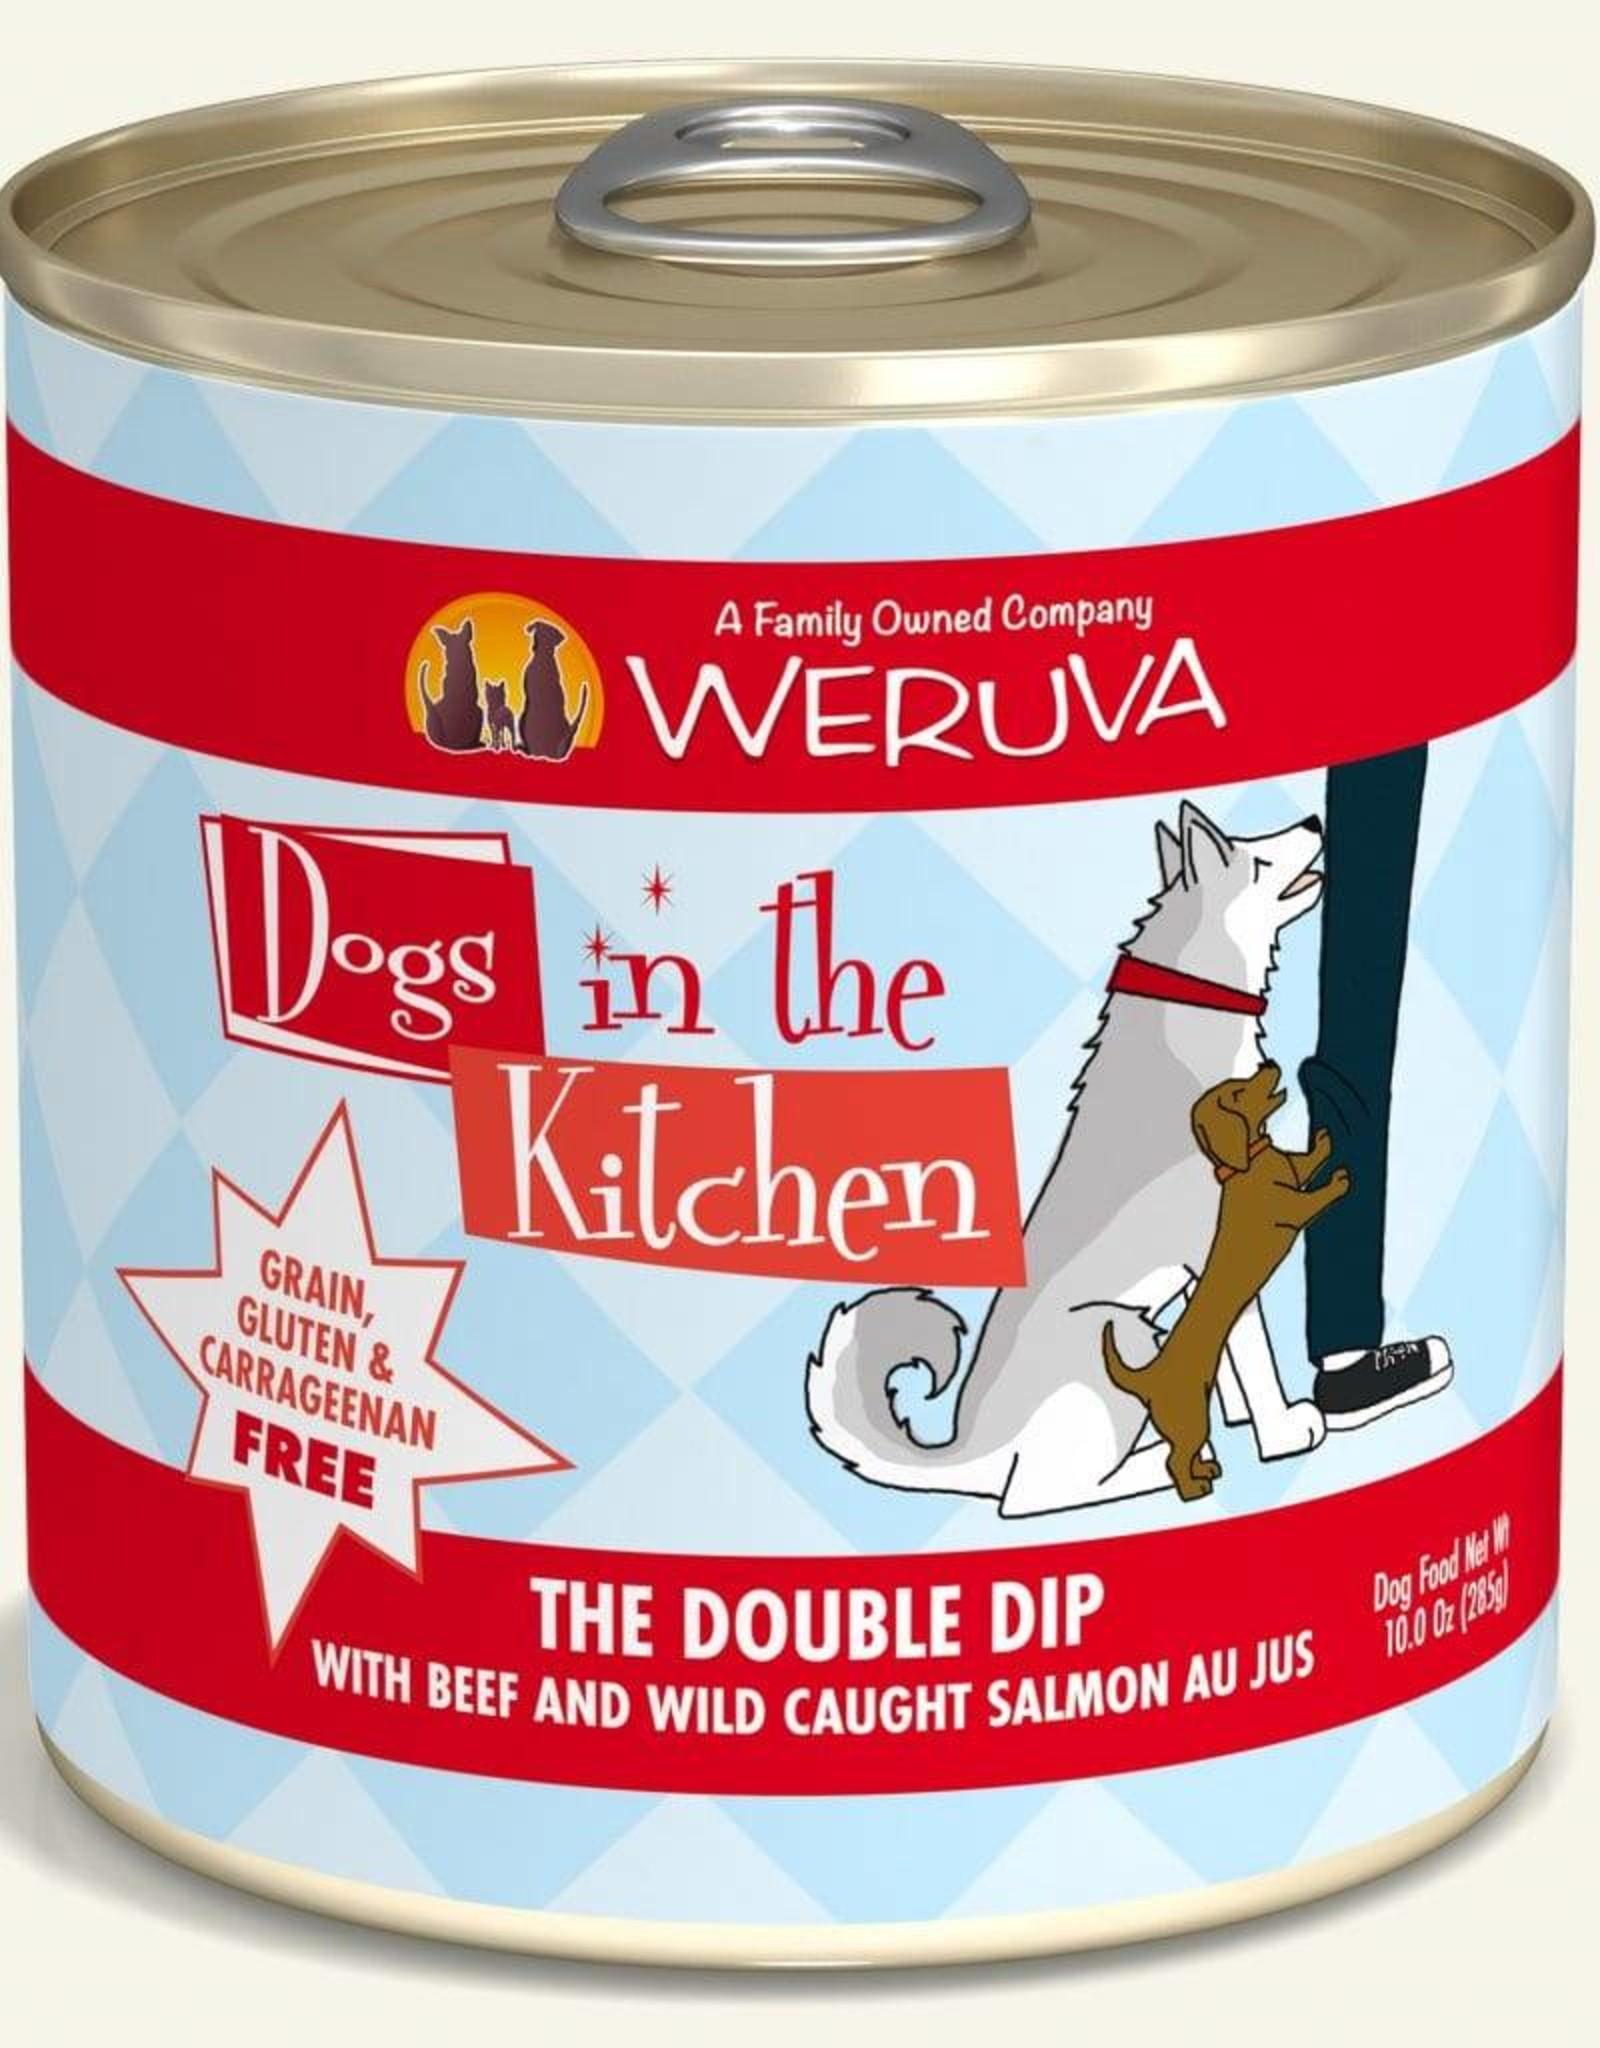 Weruva DITK The Double Dip Dog Food Can, 10 oz.